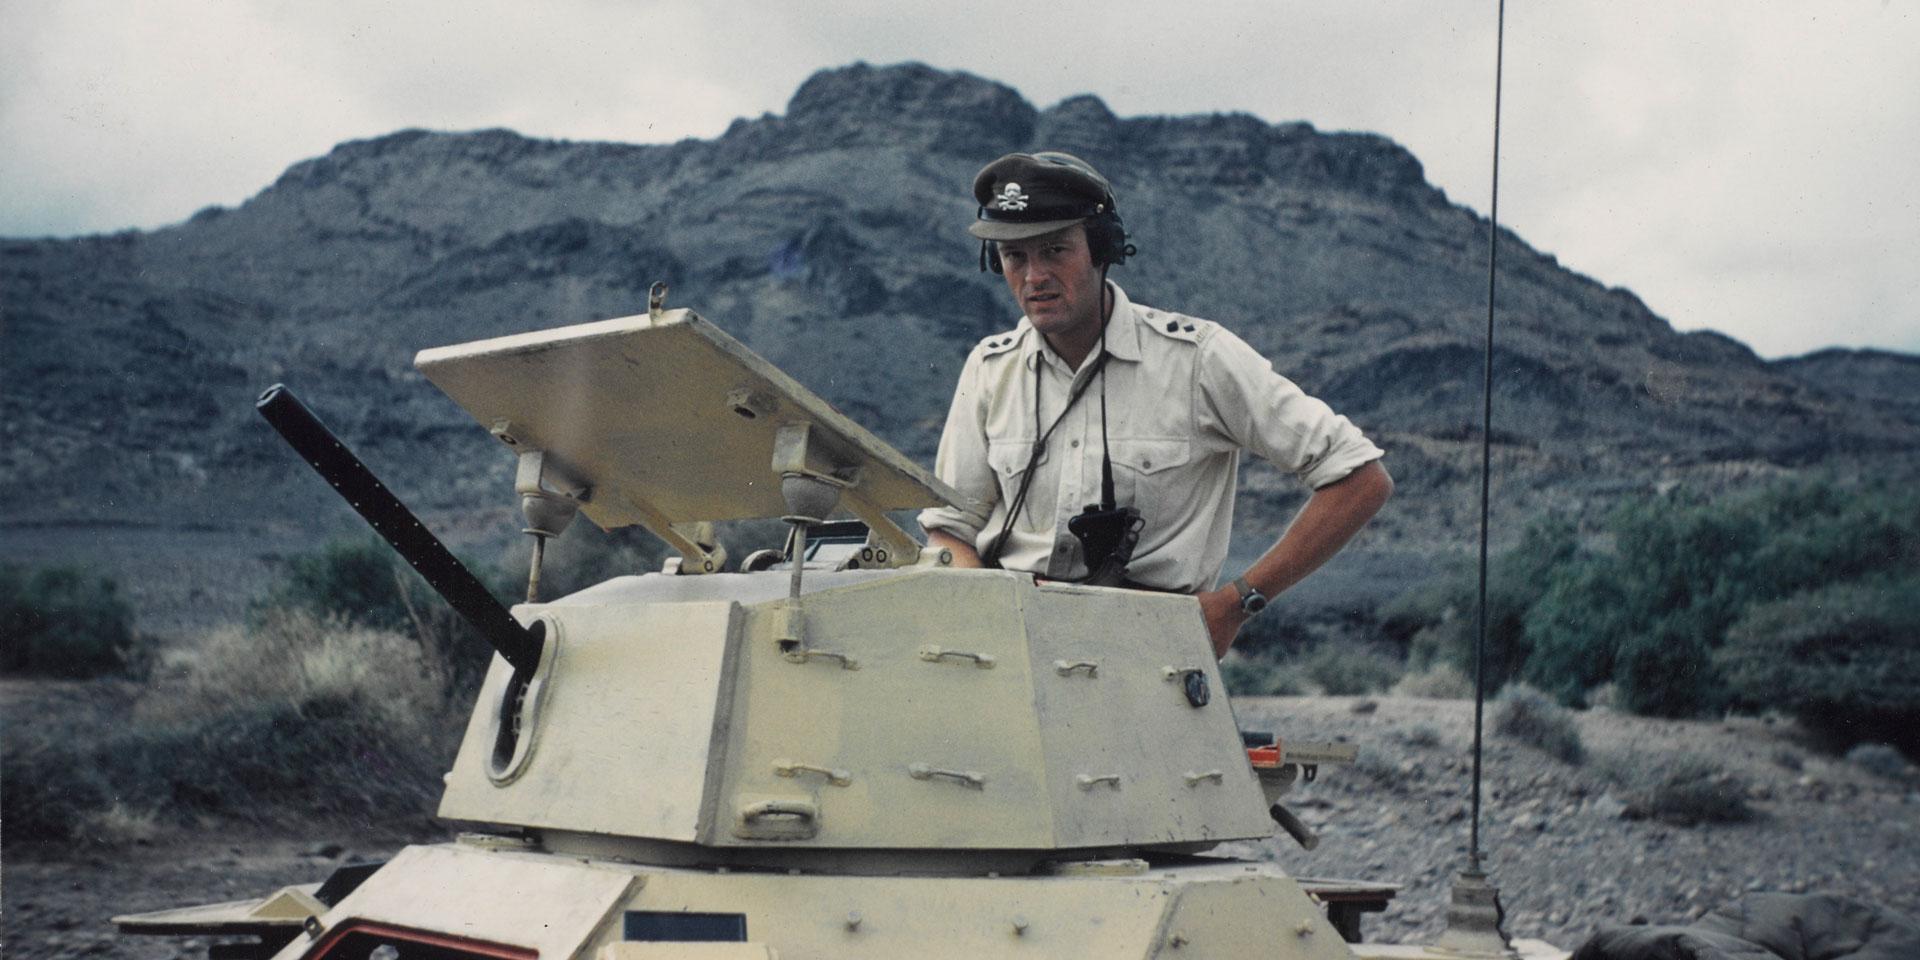 Lieutenant Antony Mallaby, 17th/21st Lancers, near Dahla on the Yemen frontier, 1962